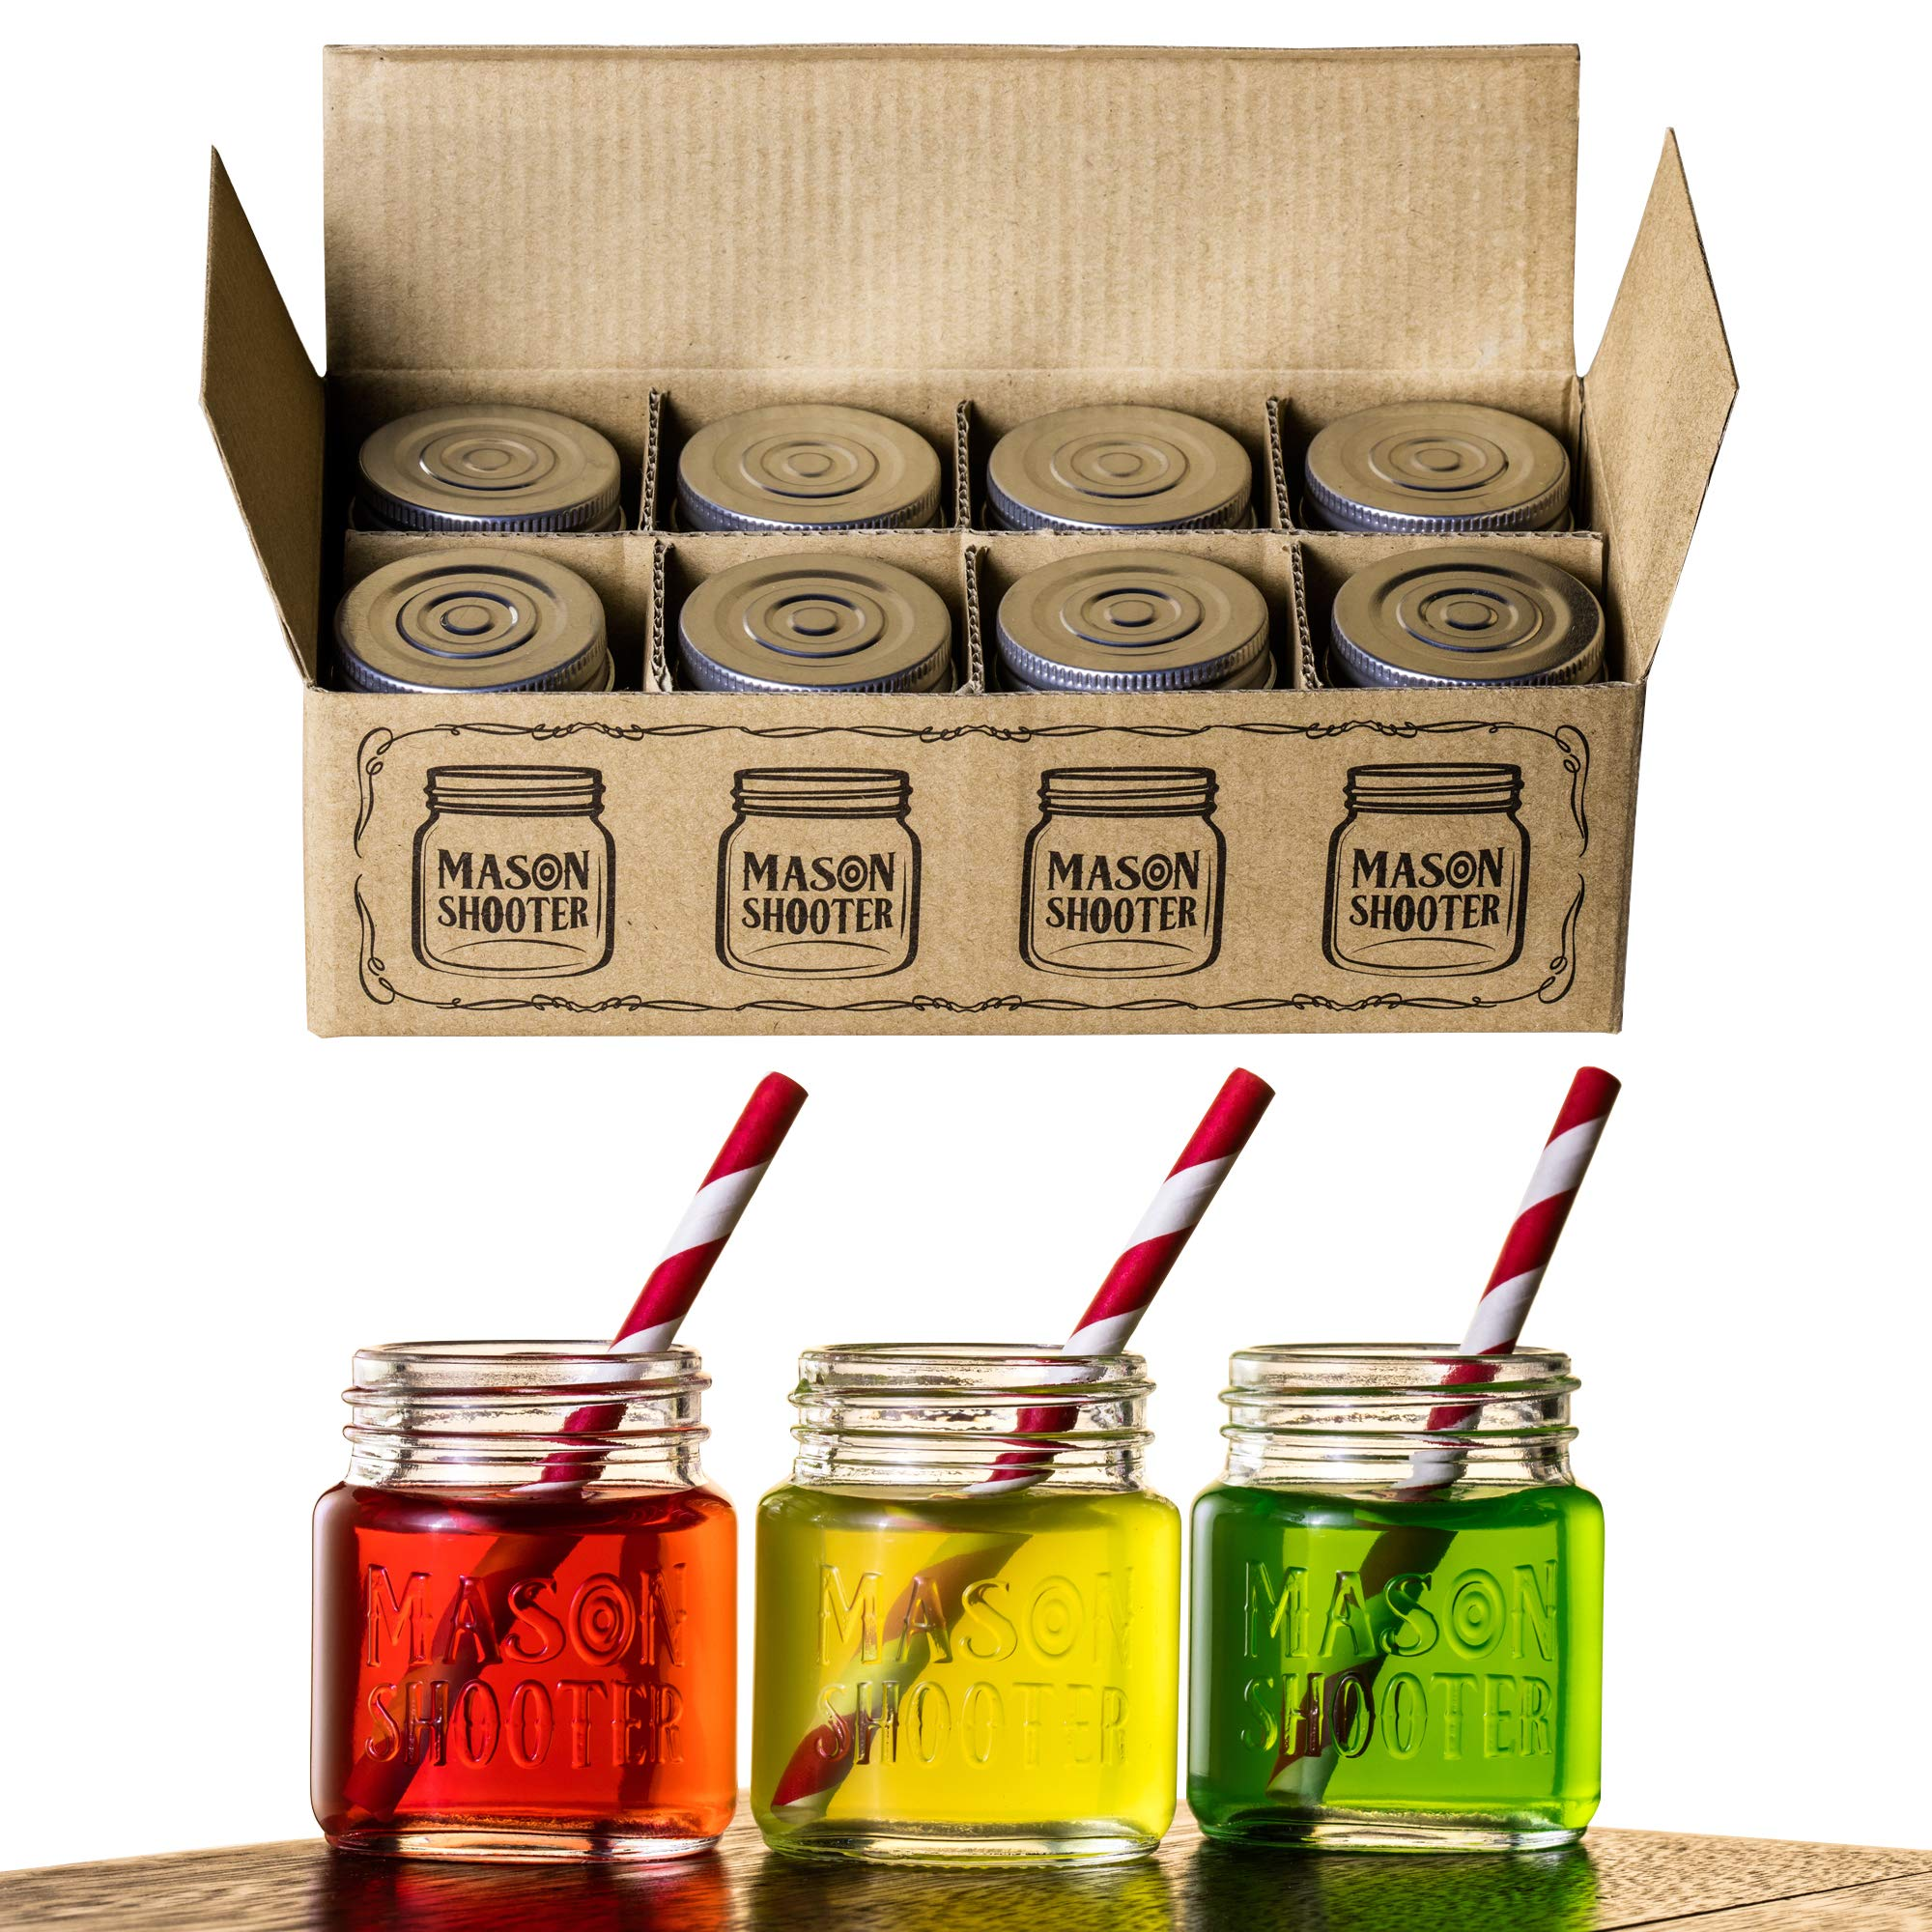 Hayley Cherie - Mason Jar Shot Glasses with Lids (Set of 8) – Mini Mason Shooter Glass - 2 Ounces